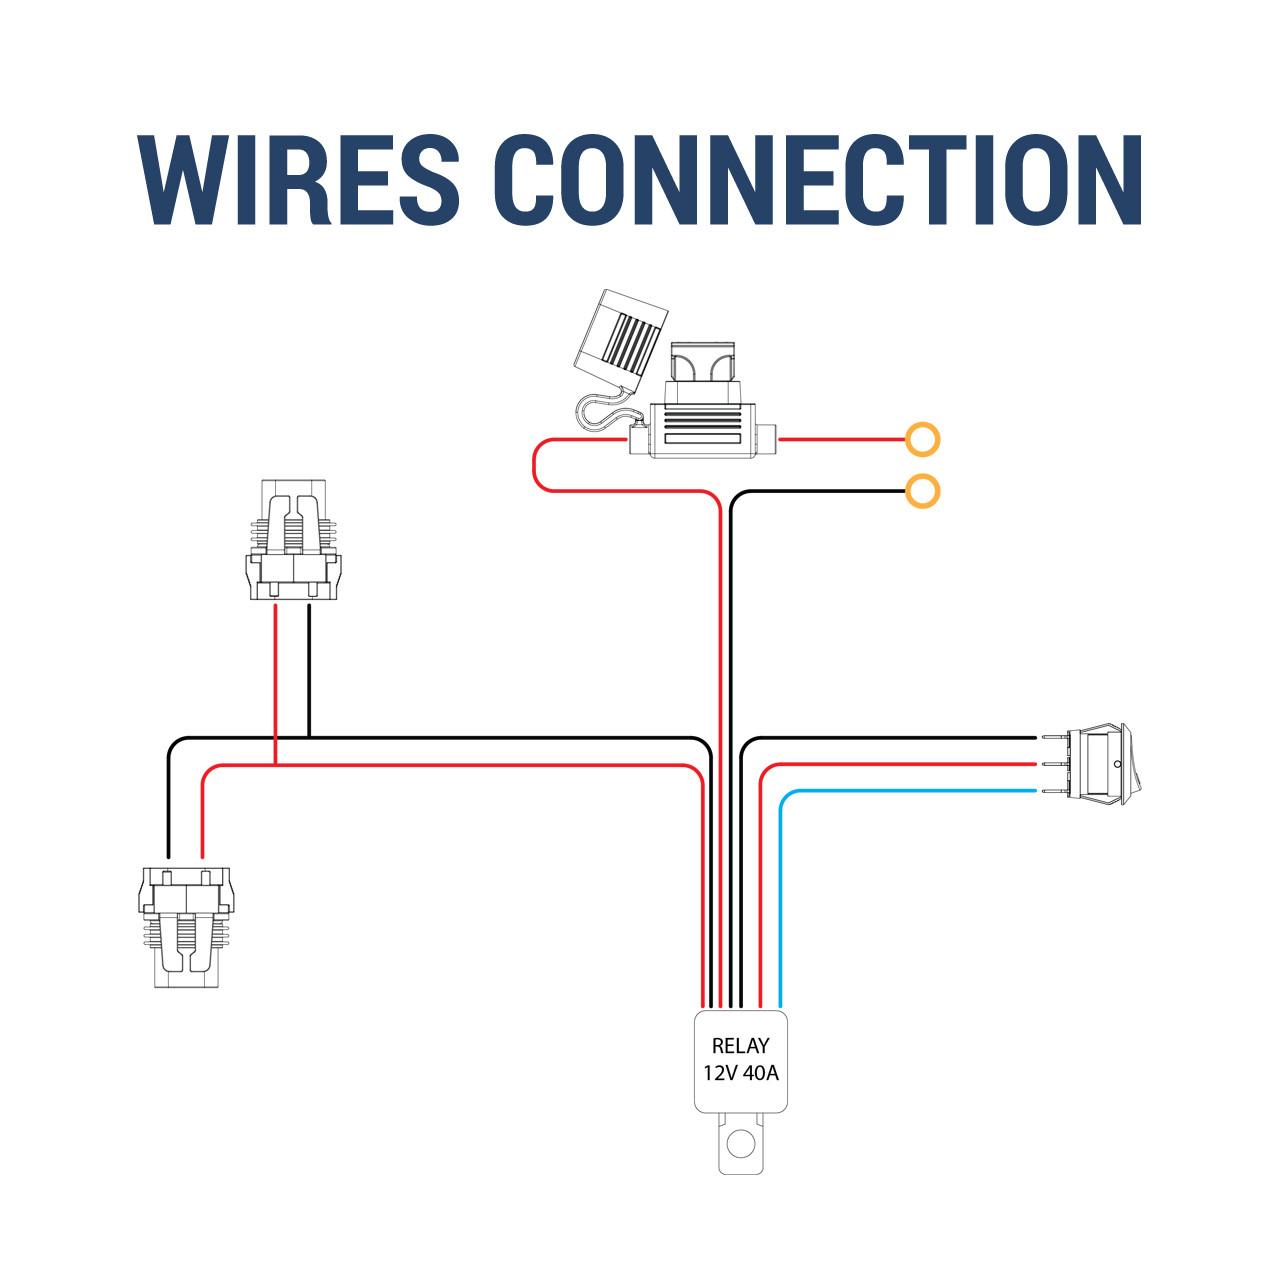 [SCHEMATICS_49CH]  9' 14 Gauge Fog Lights Wiring Harness Kit with 2 Connectors - K2 Motor | K2 Motors 12v 40 Amp Relay Wiring Diagram |  | K2 Motor